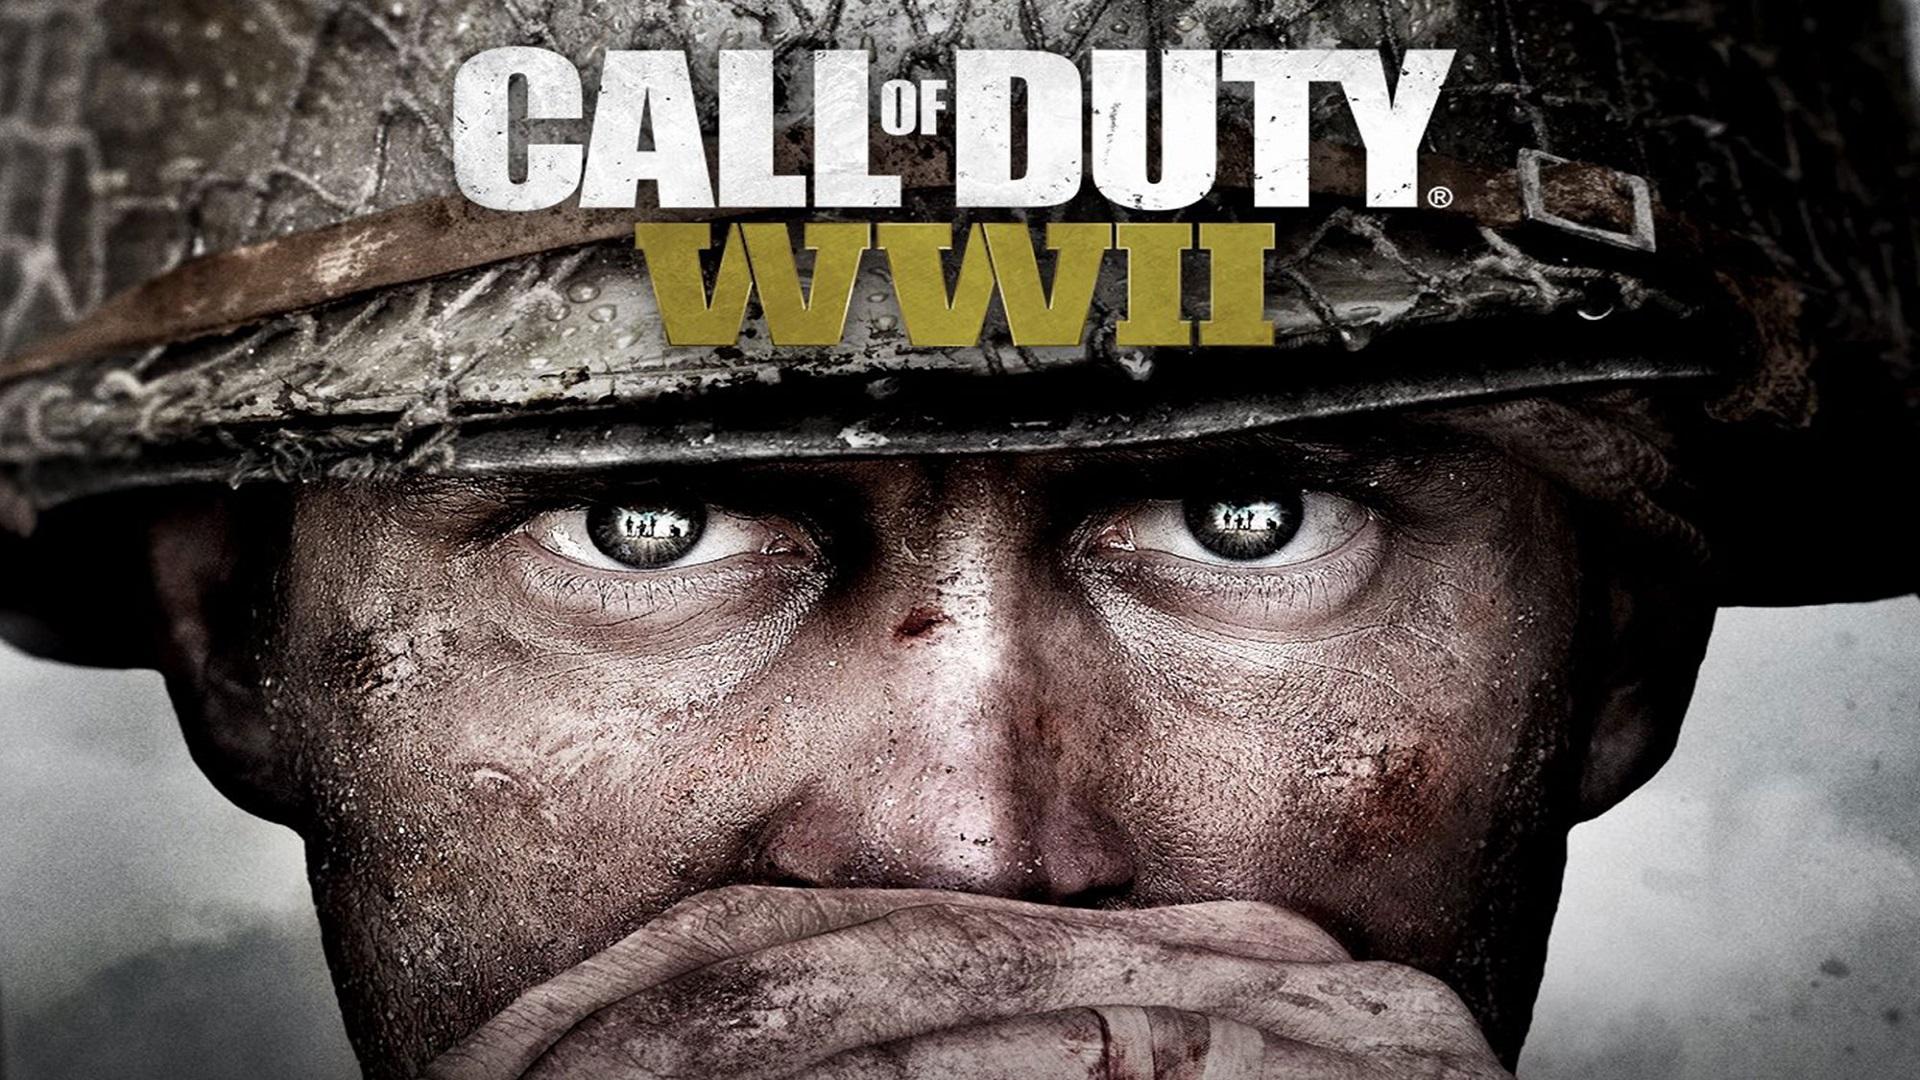 Download call of duty cod ww2 hd wallpapers - Call of duty ww2 desktop ...